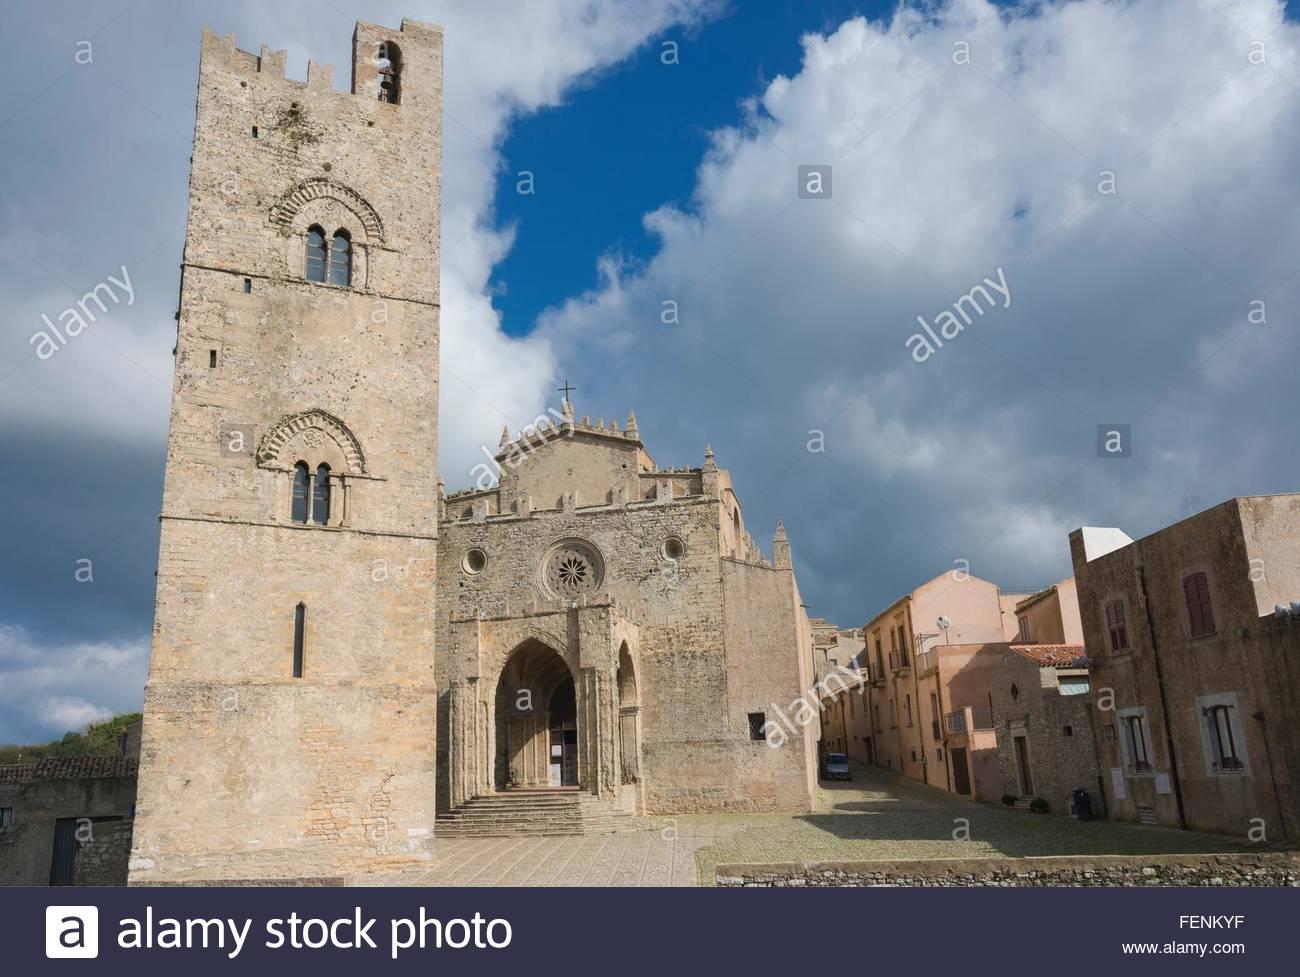 The Duomo, Erice, Sicily, Italy - Stock Image